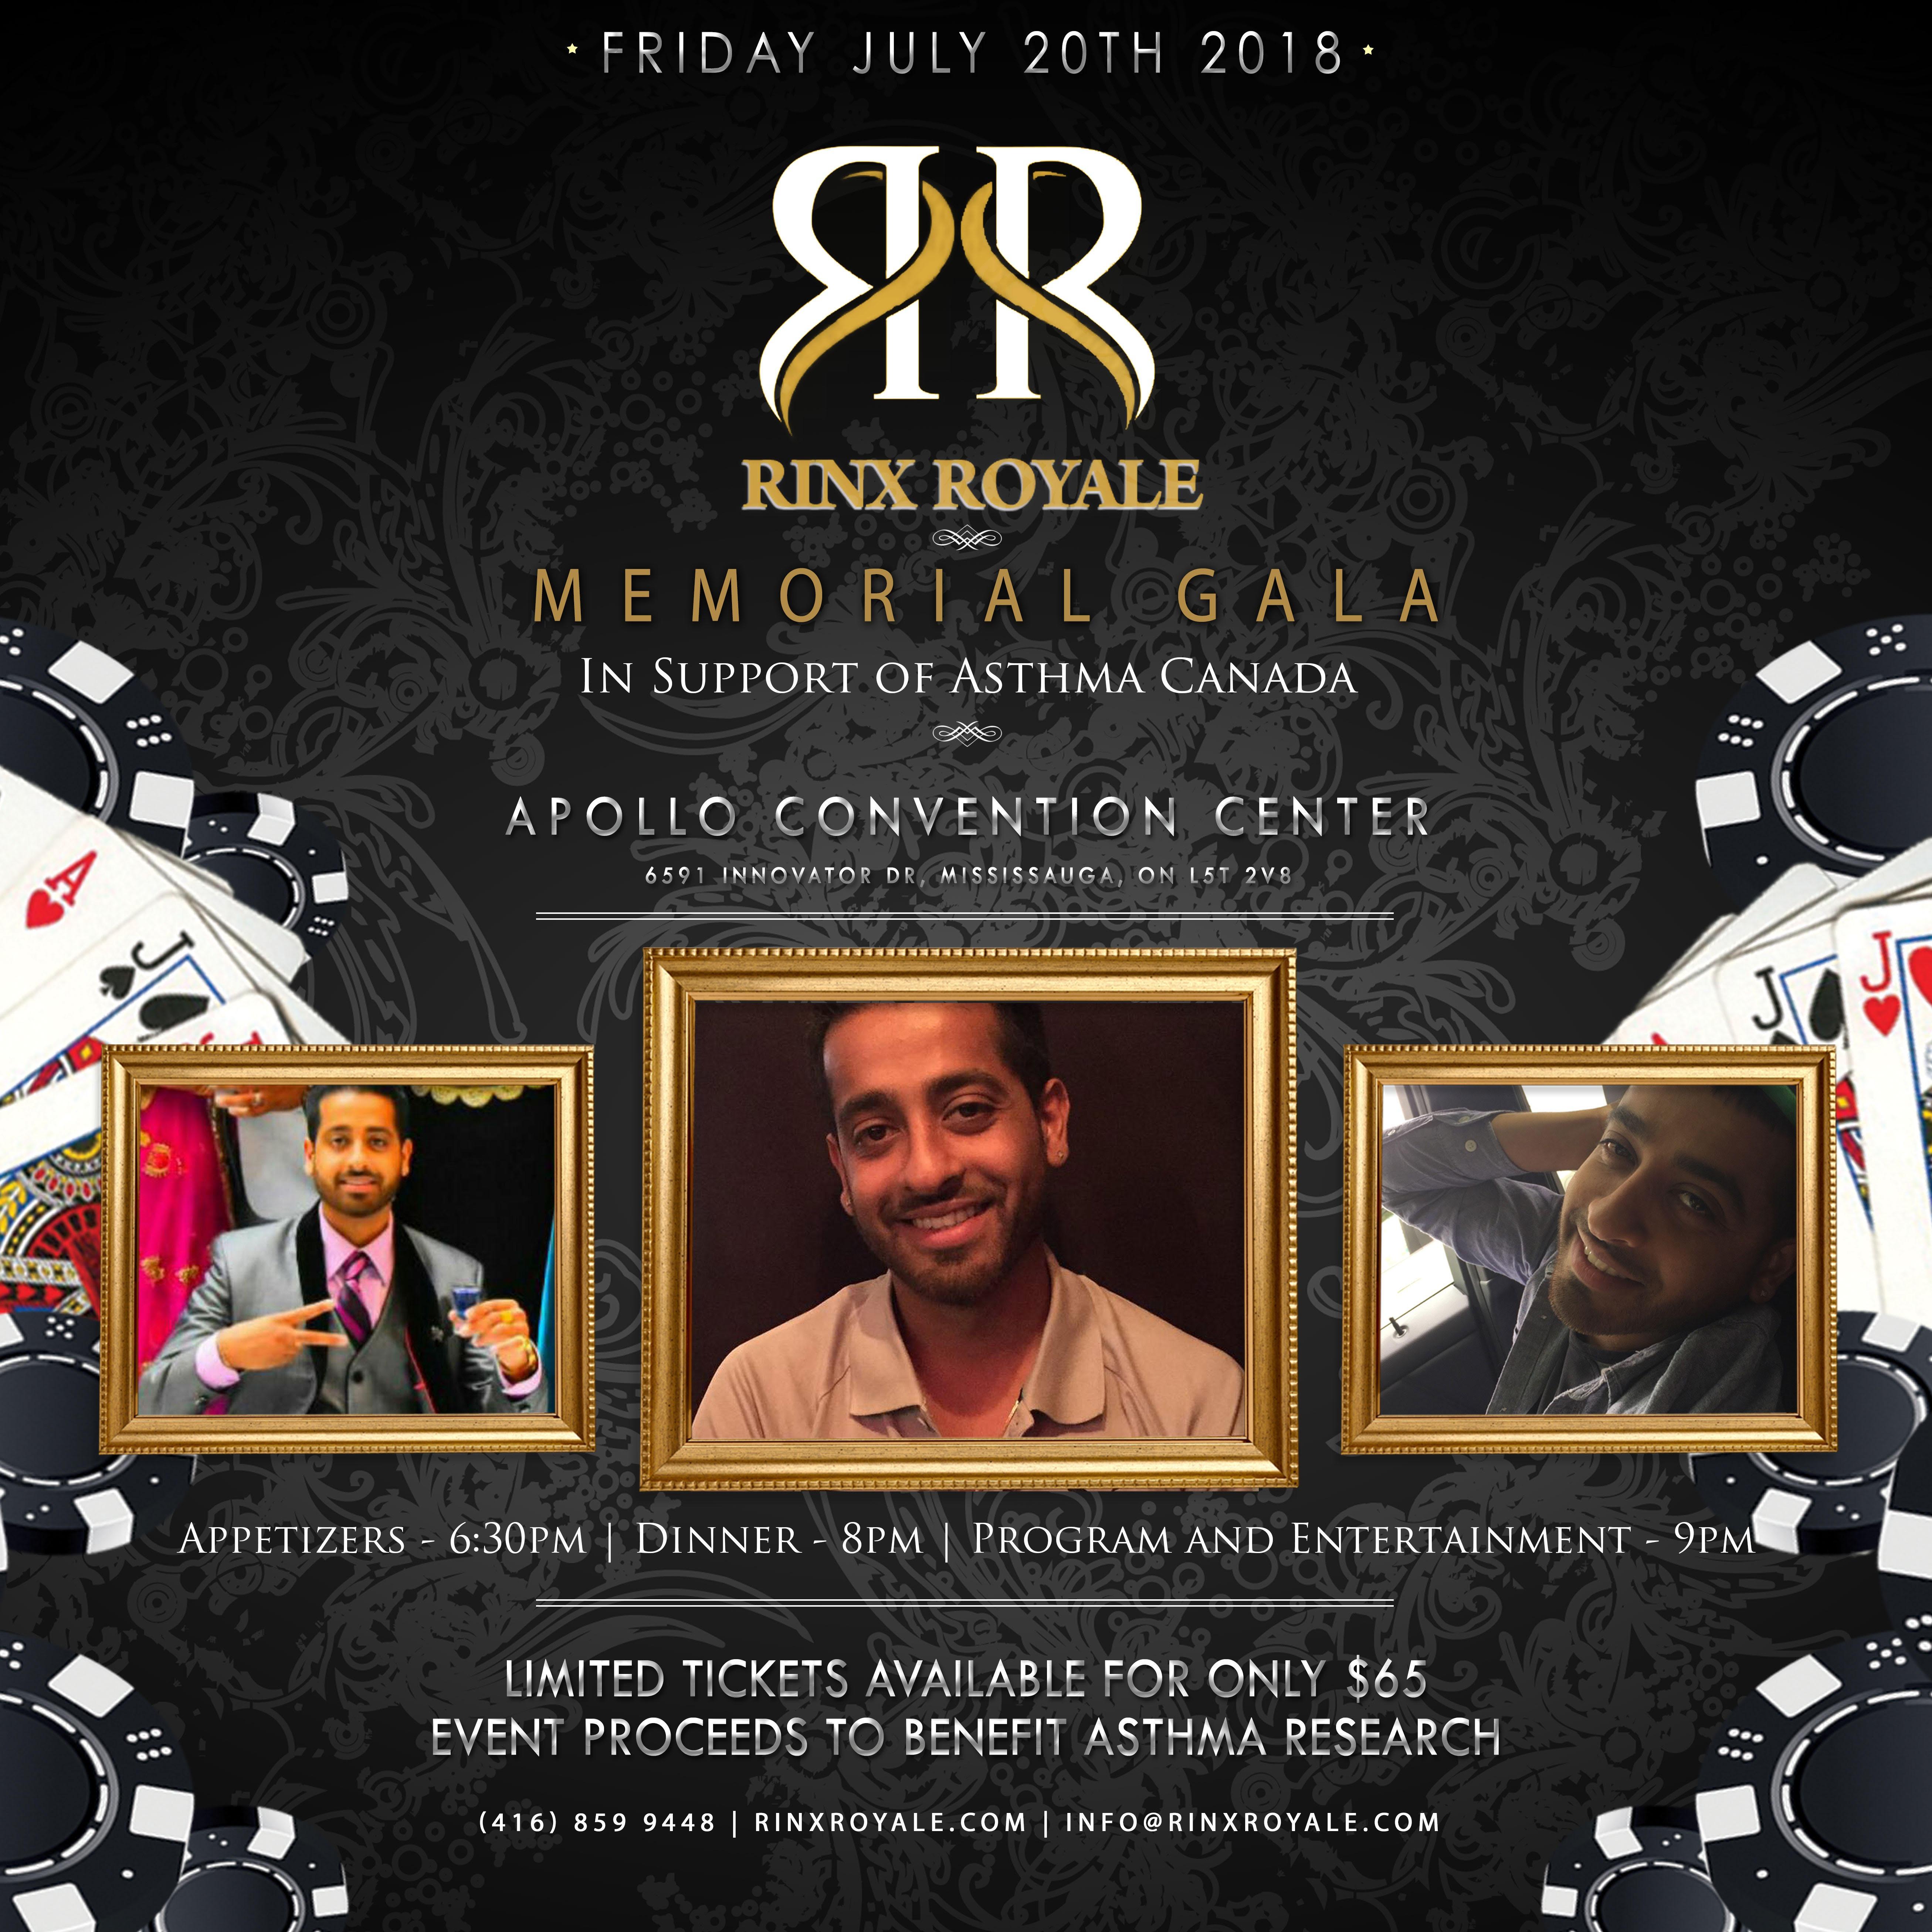 Rinx Royale Memorial Gala